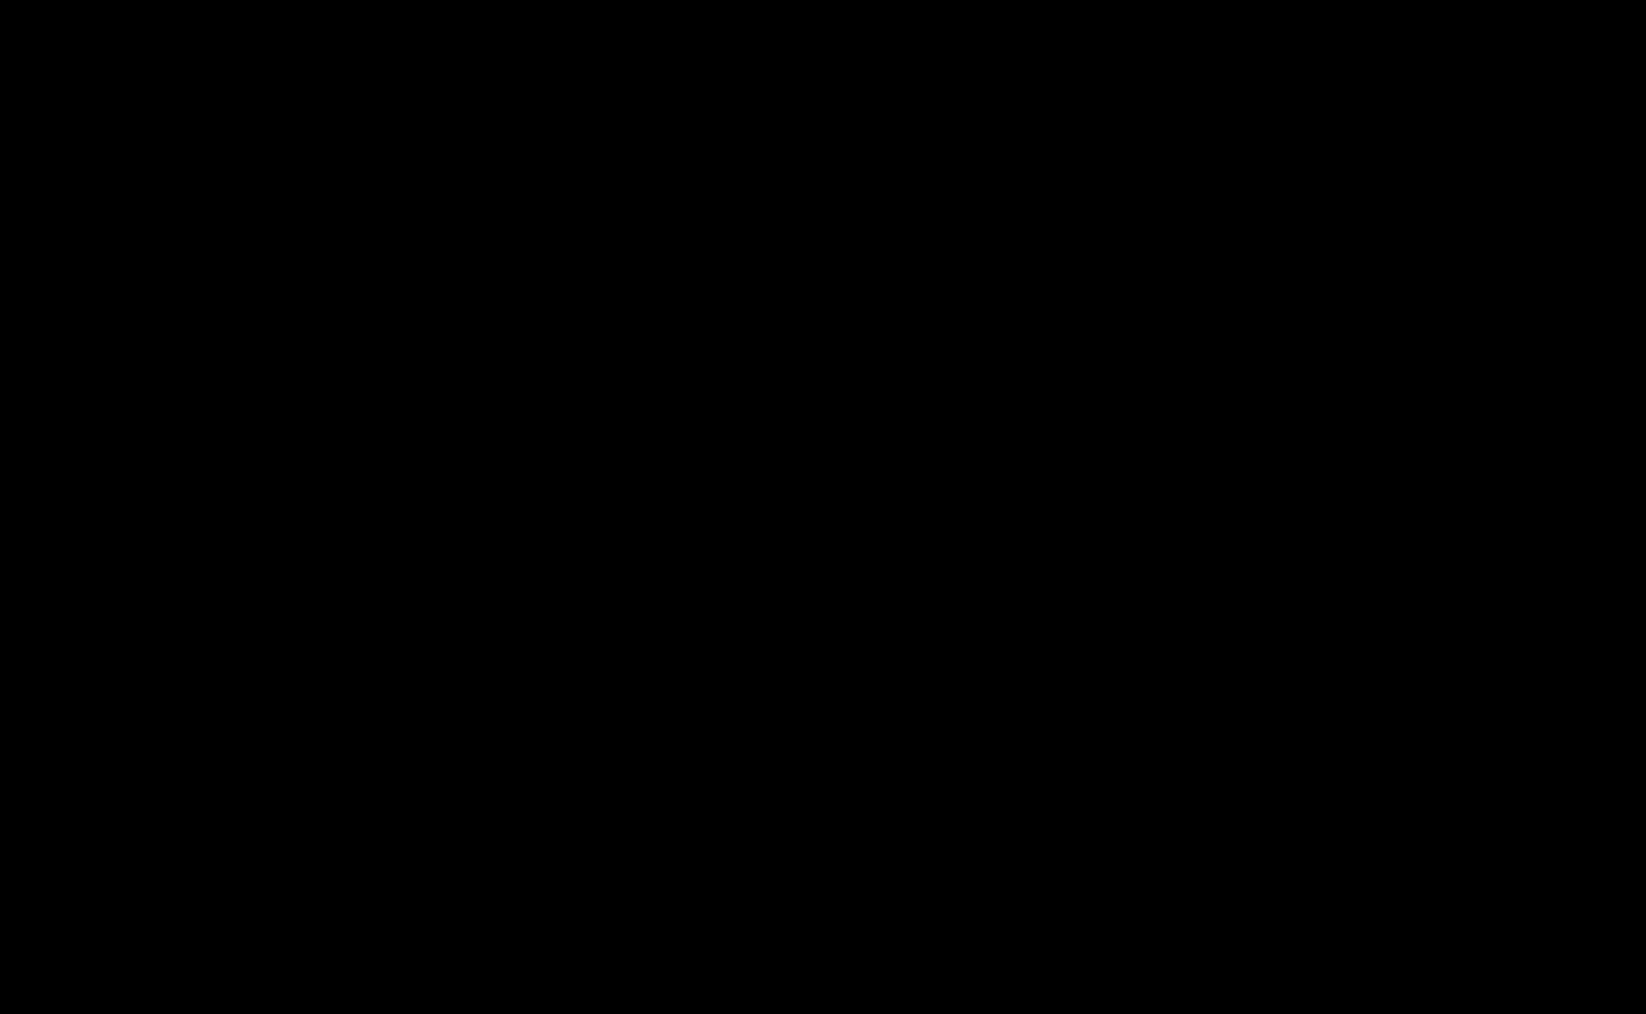 1-(3,6-Dibromo-9H-carbazol-9-yl)-3-phenoxy-d<sub>5</sub>-propan-2-ol